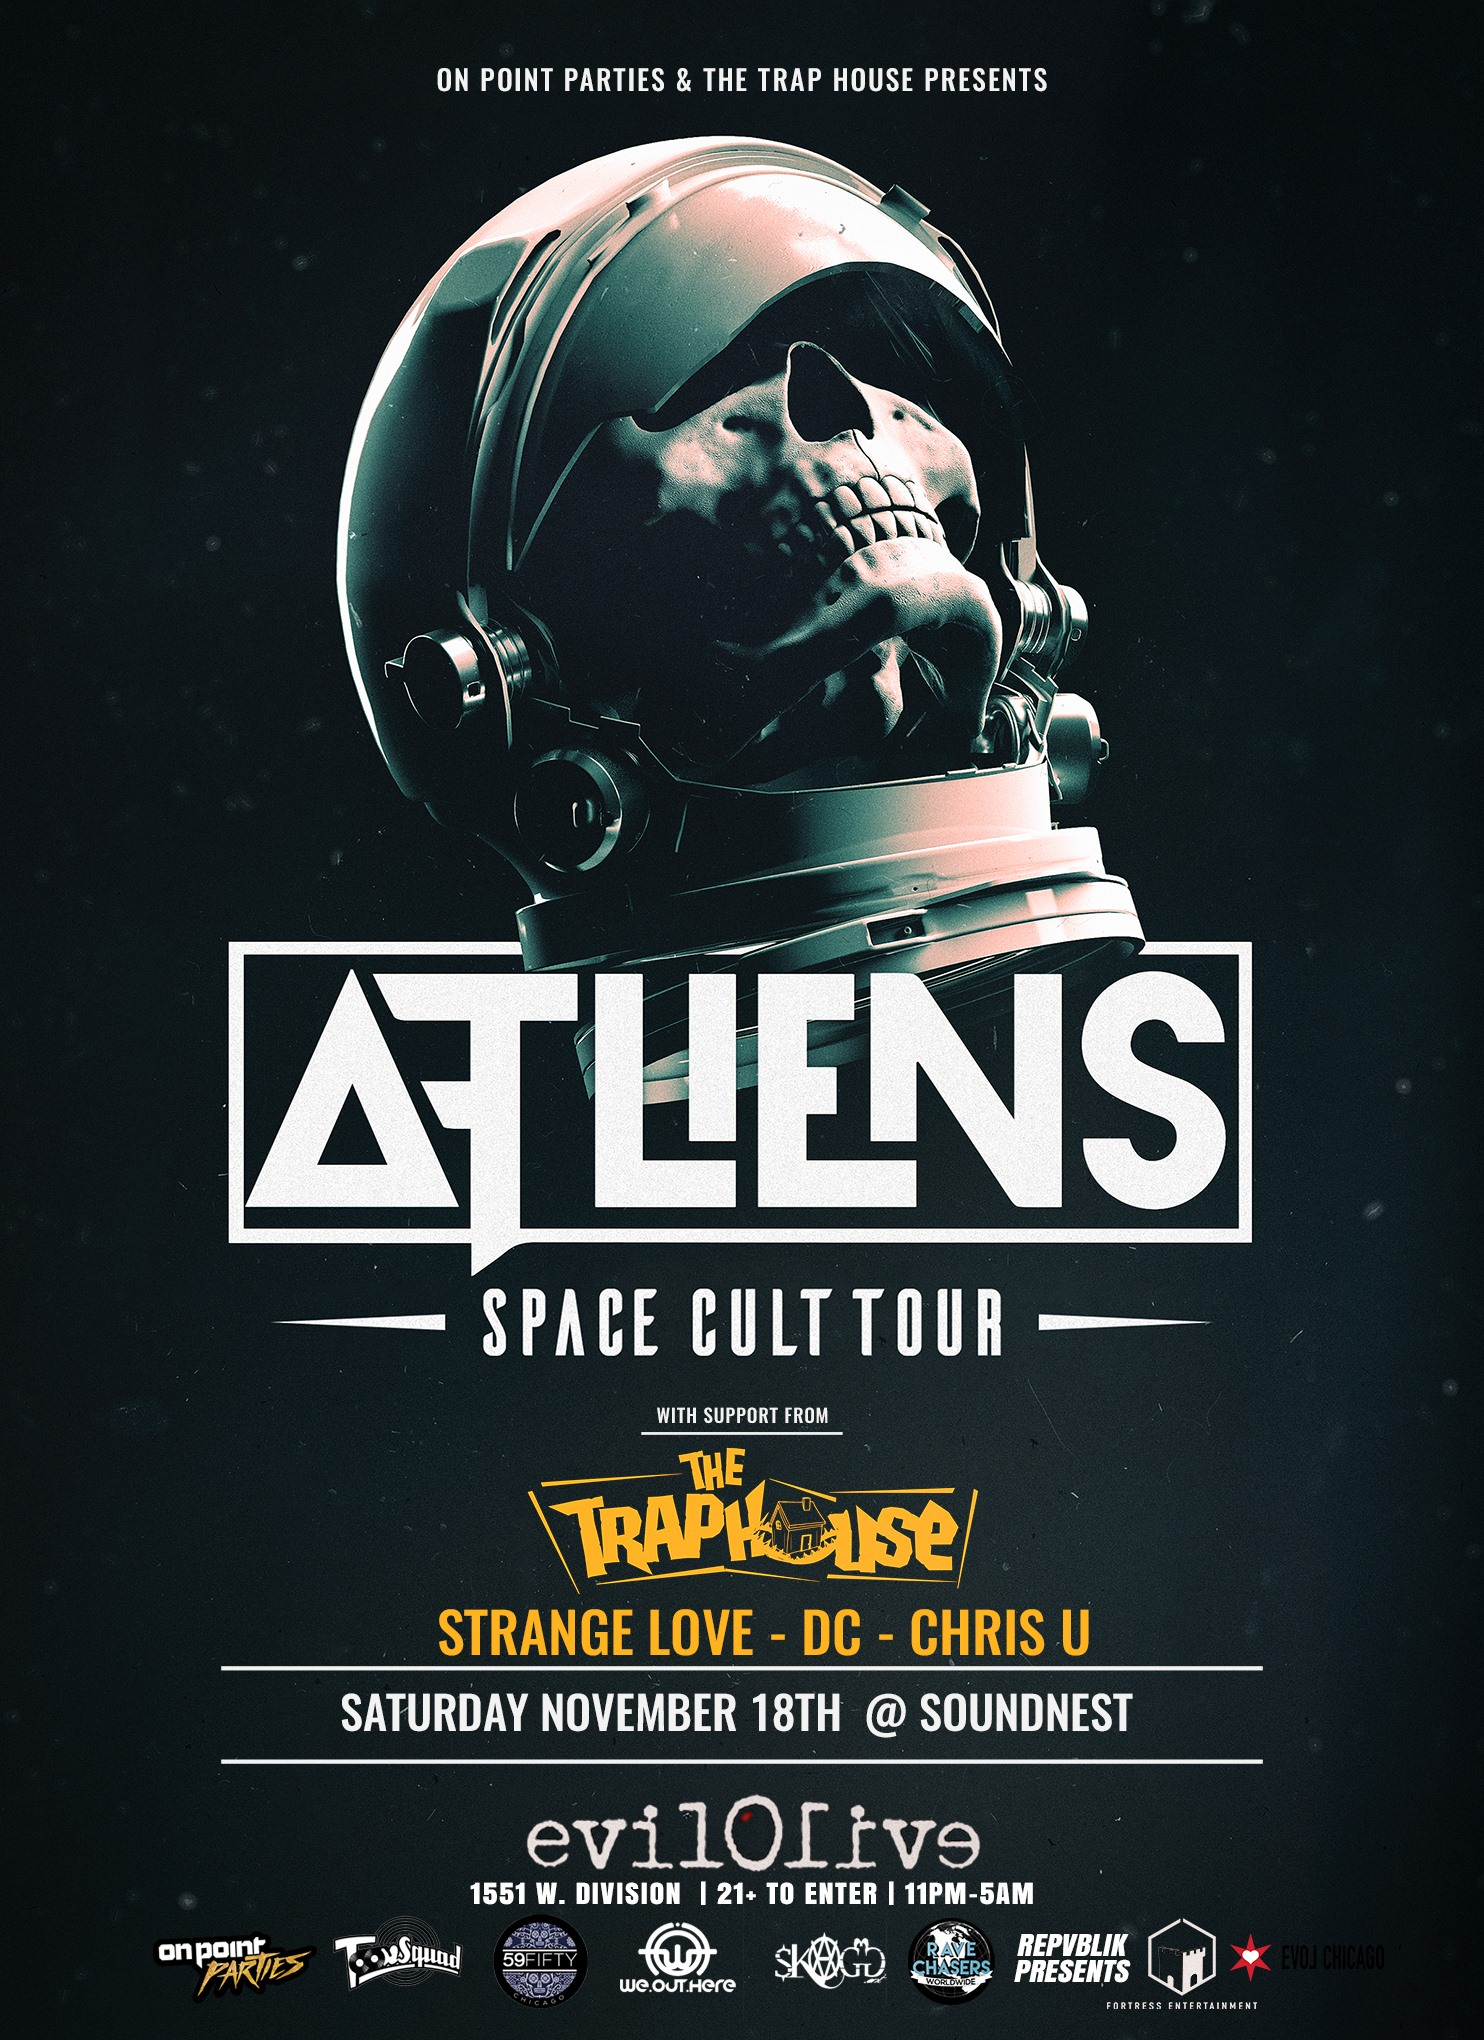 ATLiens ~Space Cult Tour~ @SoundNest w/ The Trap House & StrangeLove ...